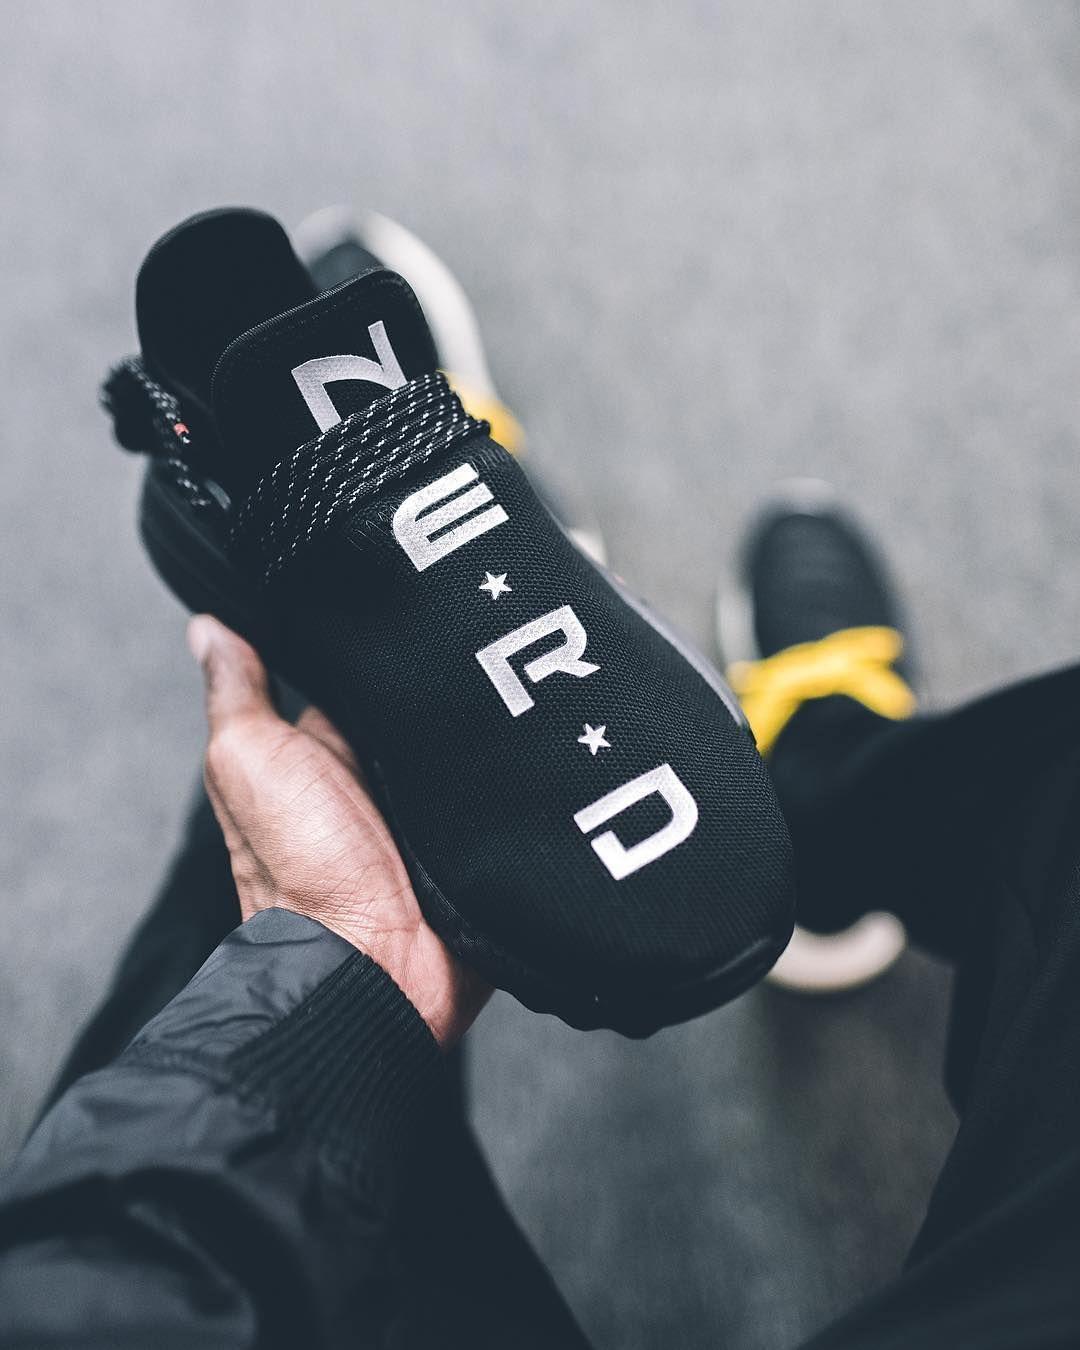 Pin Oleh Sirajul Elfauzan02 Di Man Shoes Di 2020 Sepatu Pria